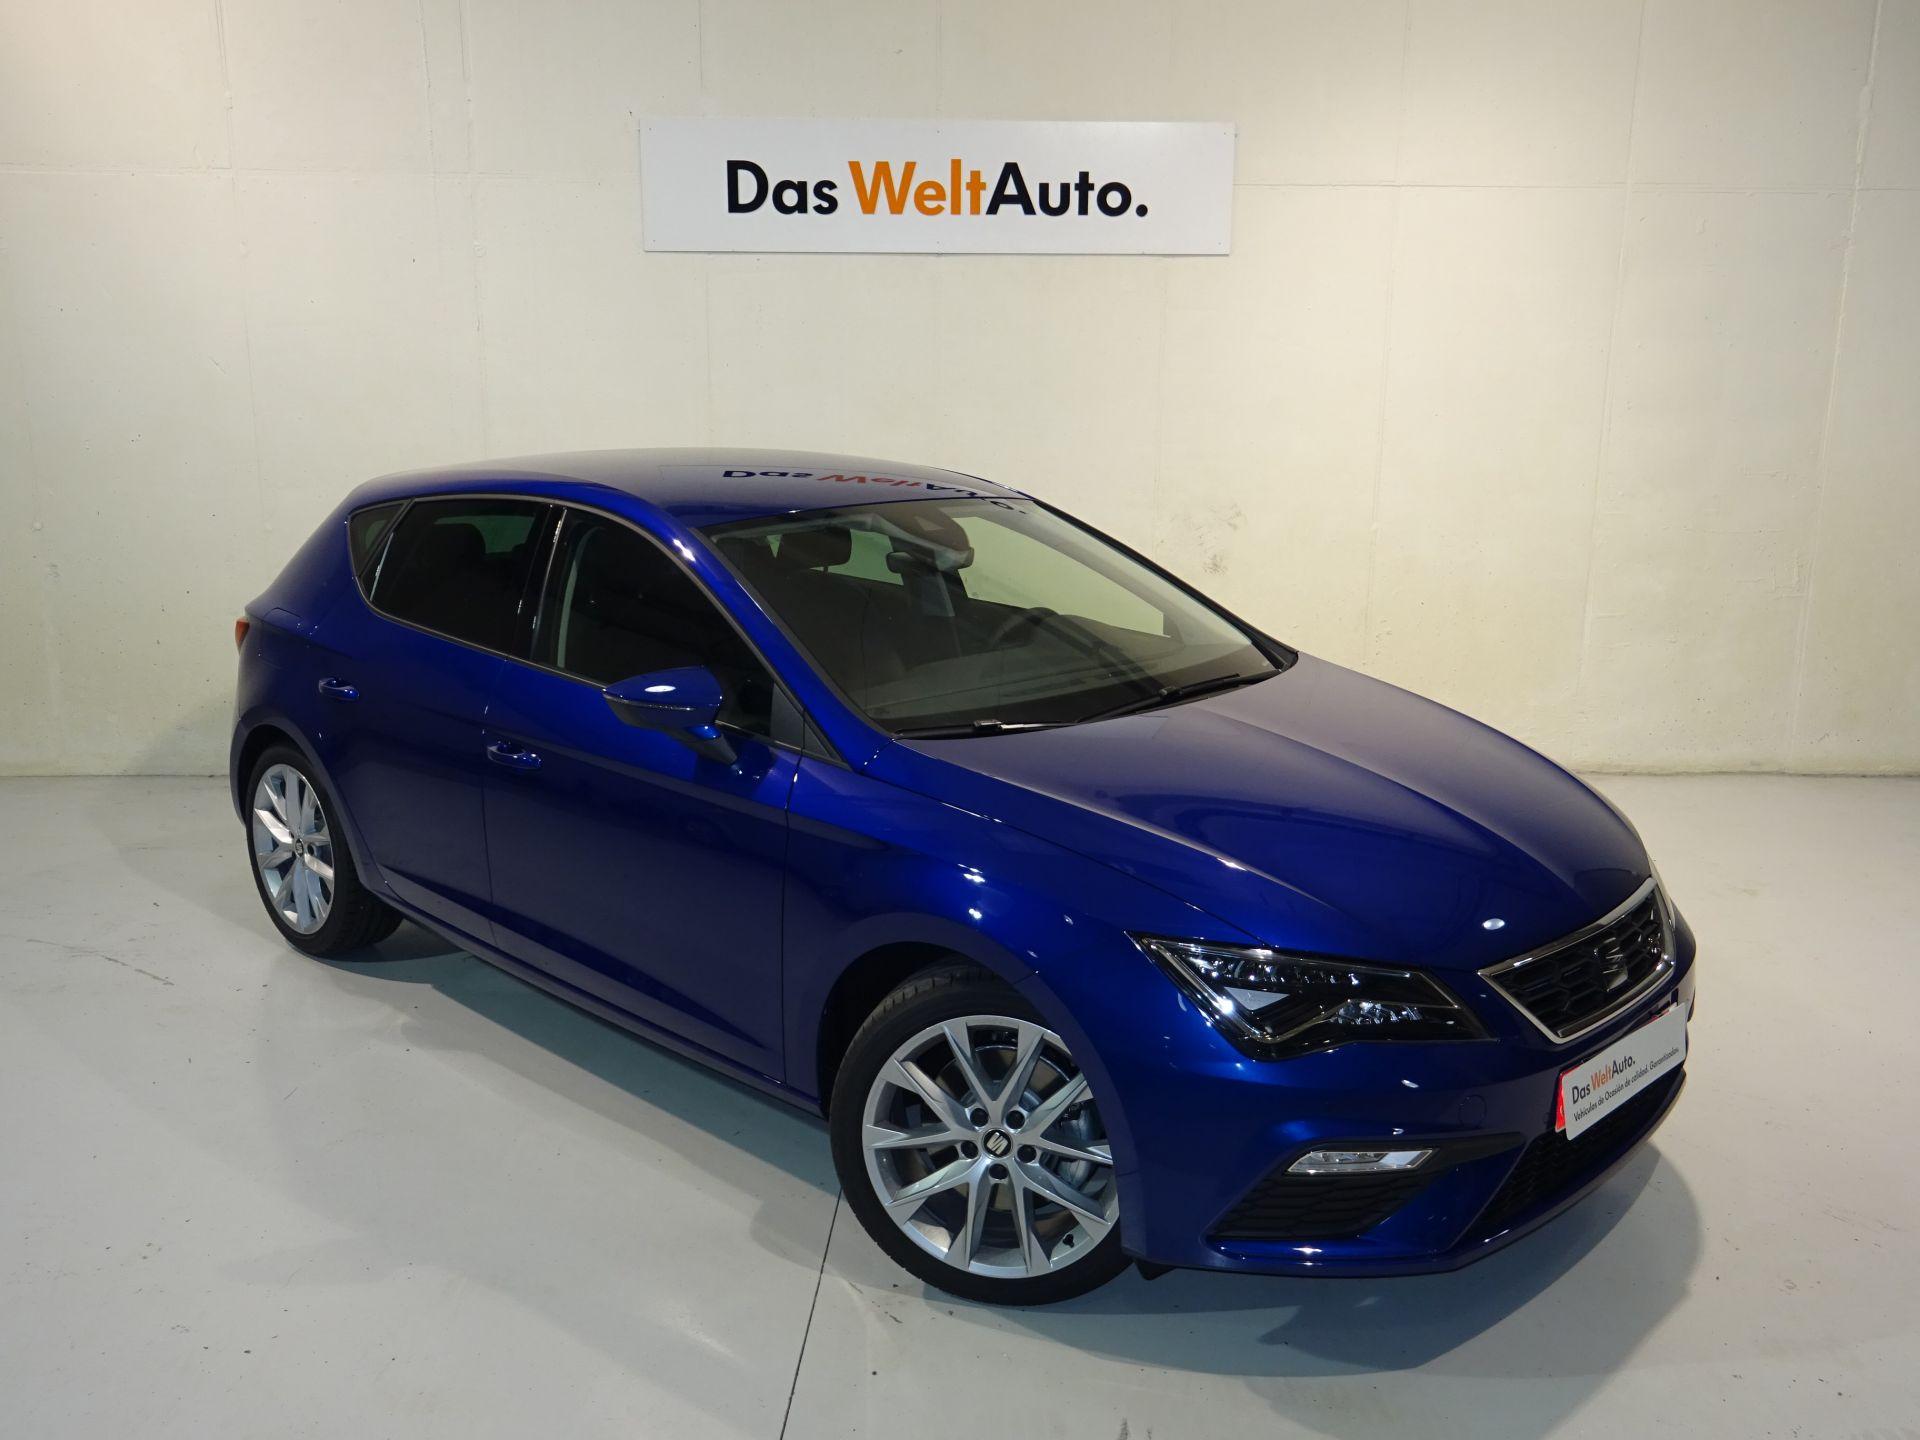 SEAT Leon 1.5 TSI 110kW (150CV) S&S FR Fast Ed